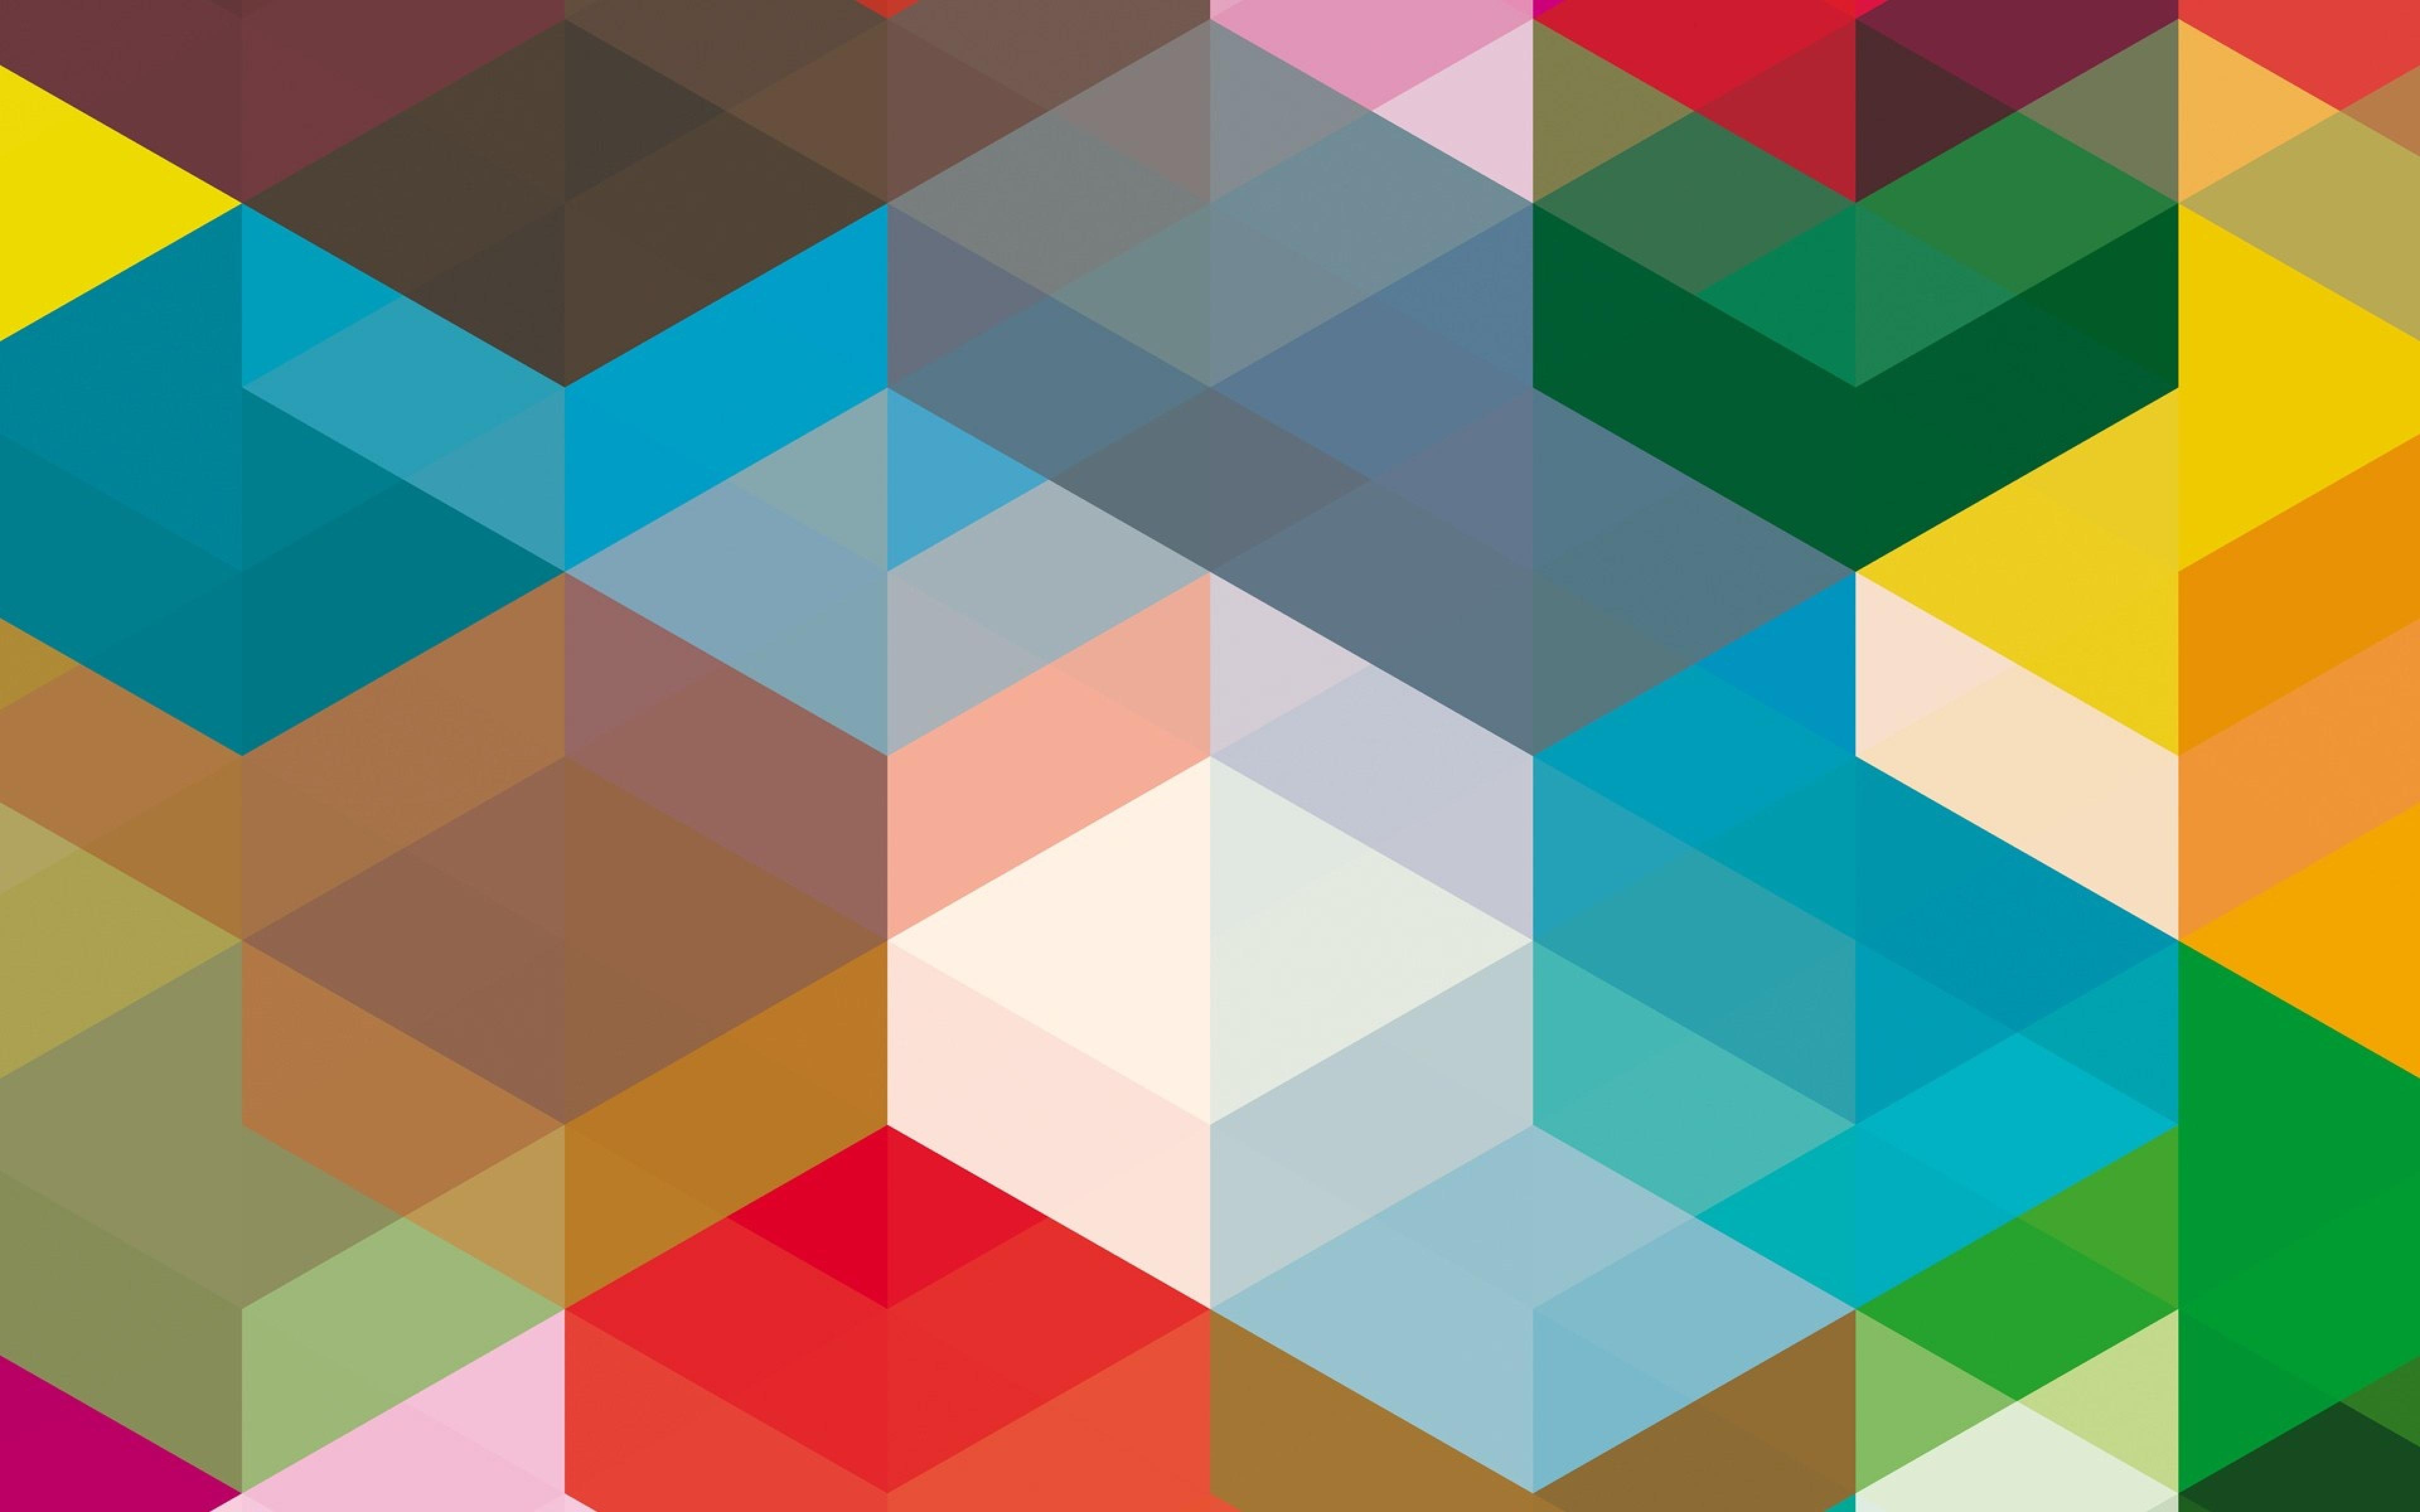 Best Shapes Wallpaper